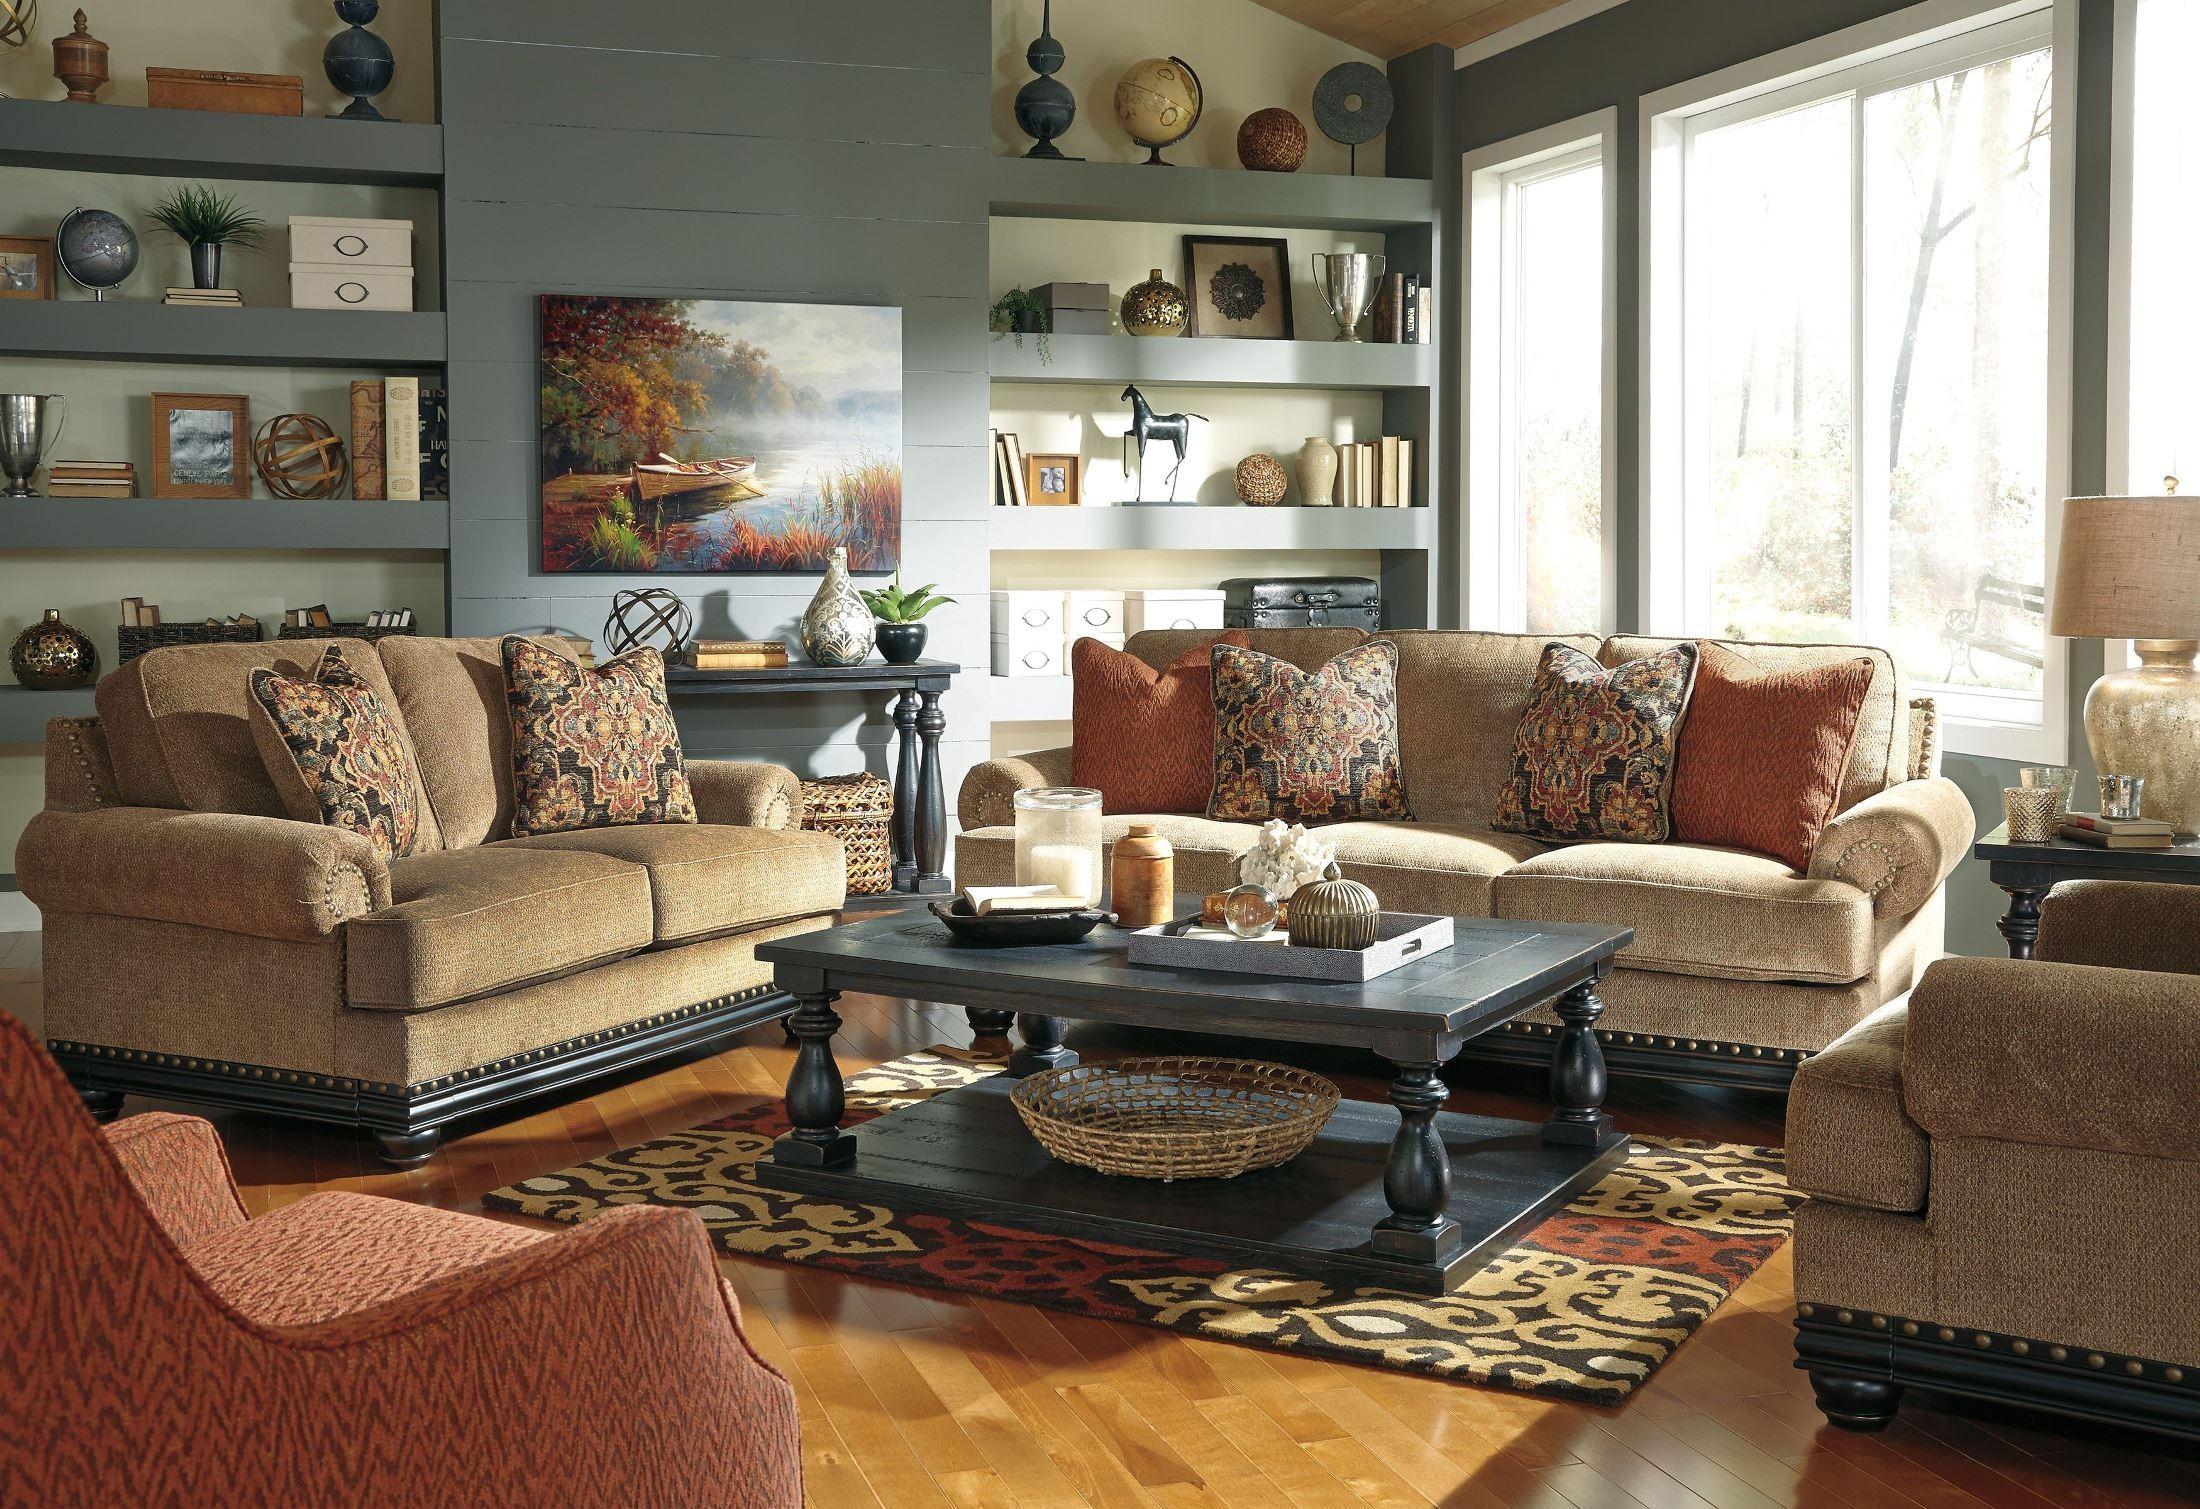 Mallacar Sofa Table from Ashley T880 4